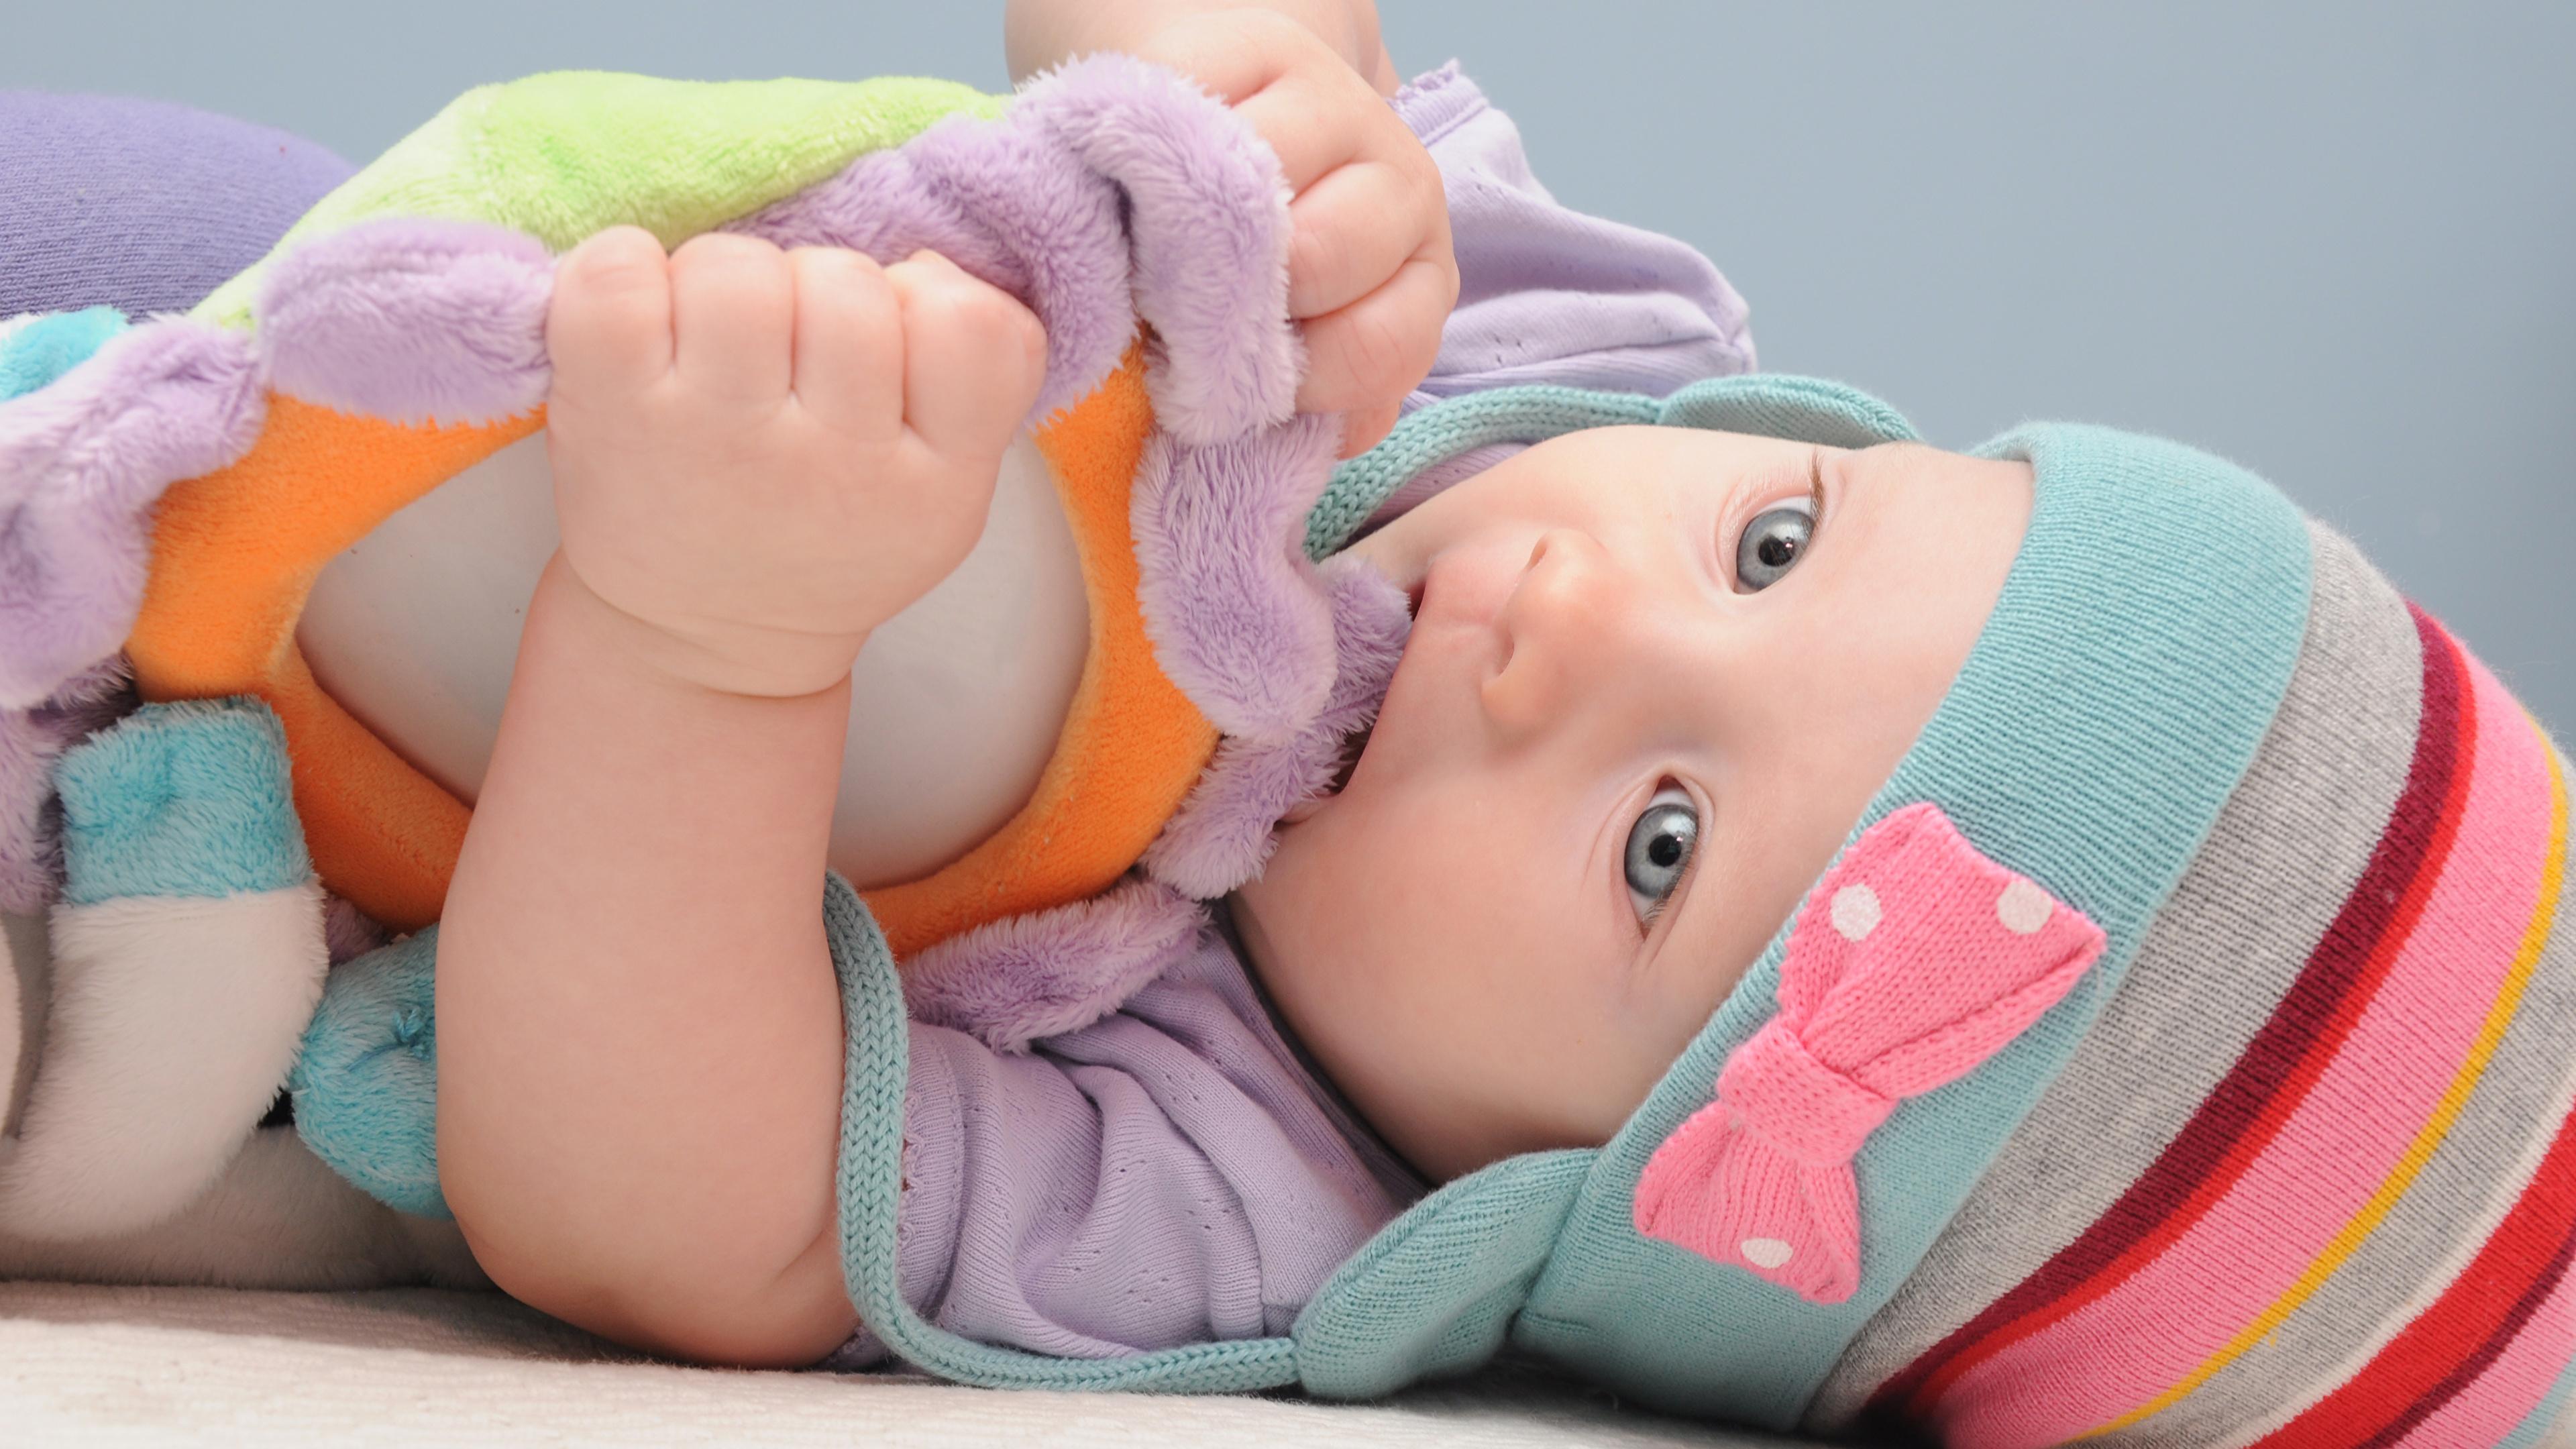 Обои младенец Ребёнок в шапке Игрушки 3840x2160 младенца Младенцы грудной ребёнок Дети Шапки шапка